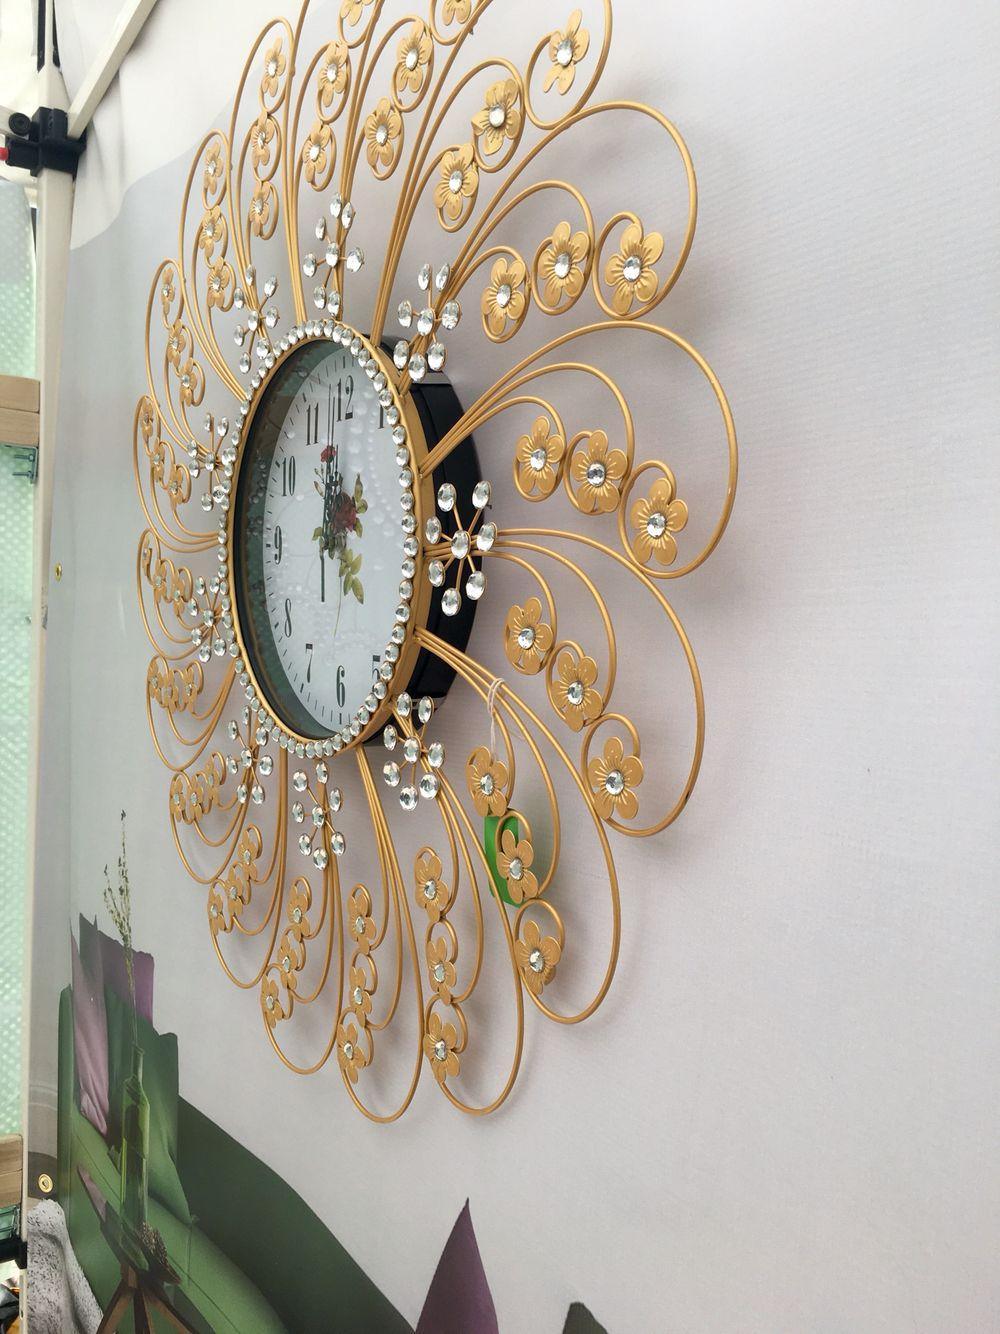 Silent Wall Clock Golden Flower Elegance Design For Home